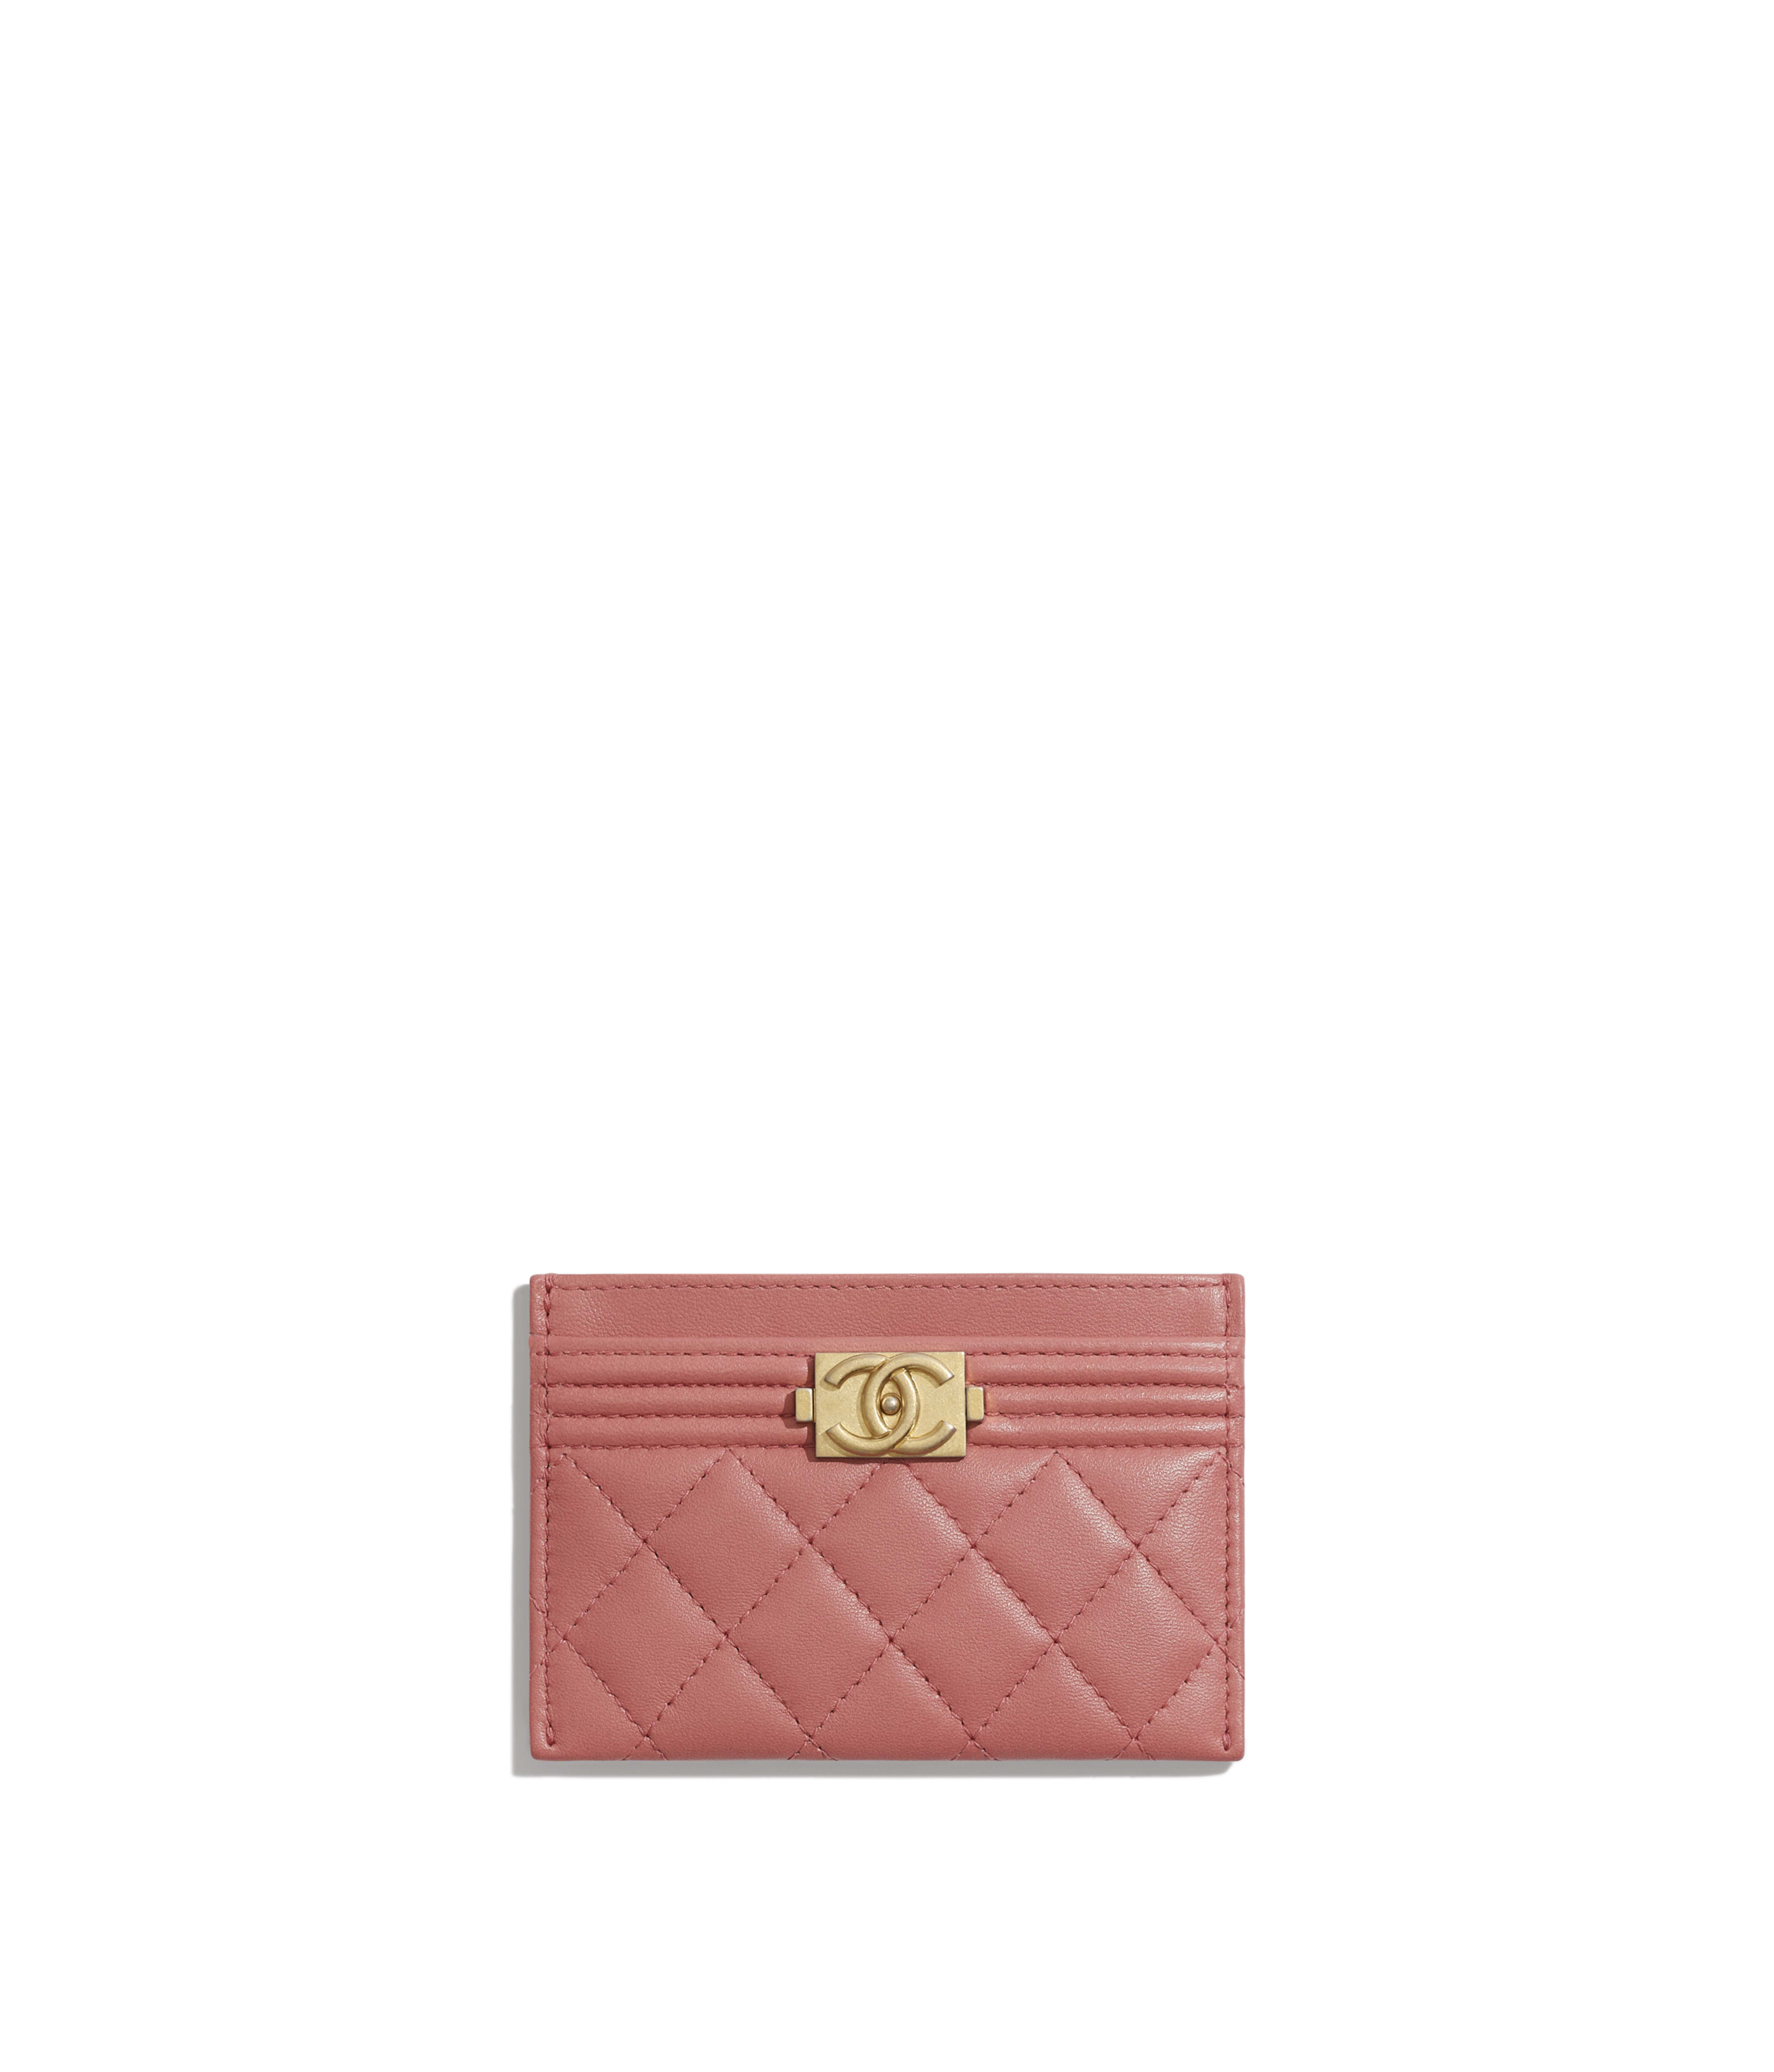 0244aac3754 BOY CHANEL Card Holder Lambskin & Gold-Tone Metal, Pink Ref.  A84431Y07659N4852